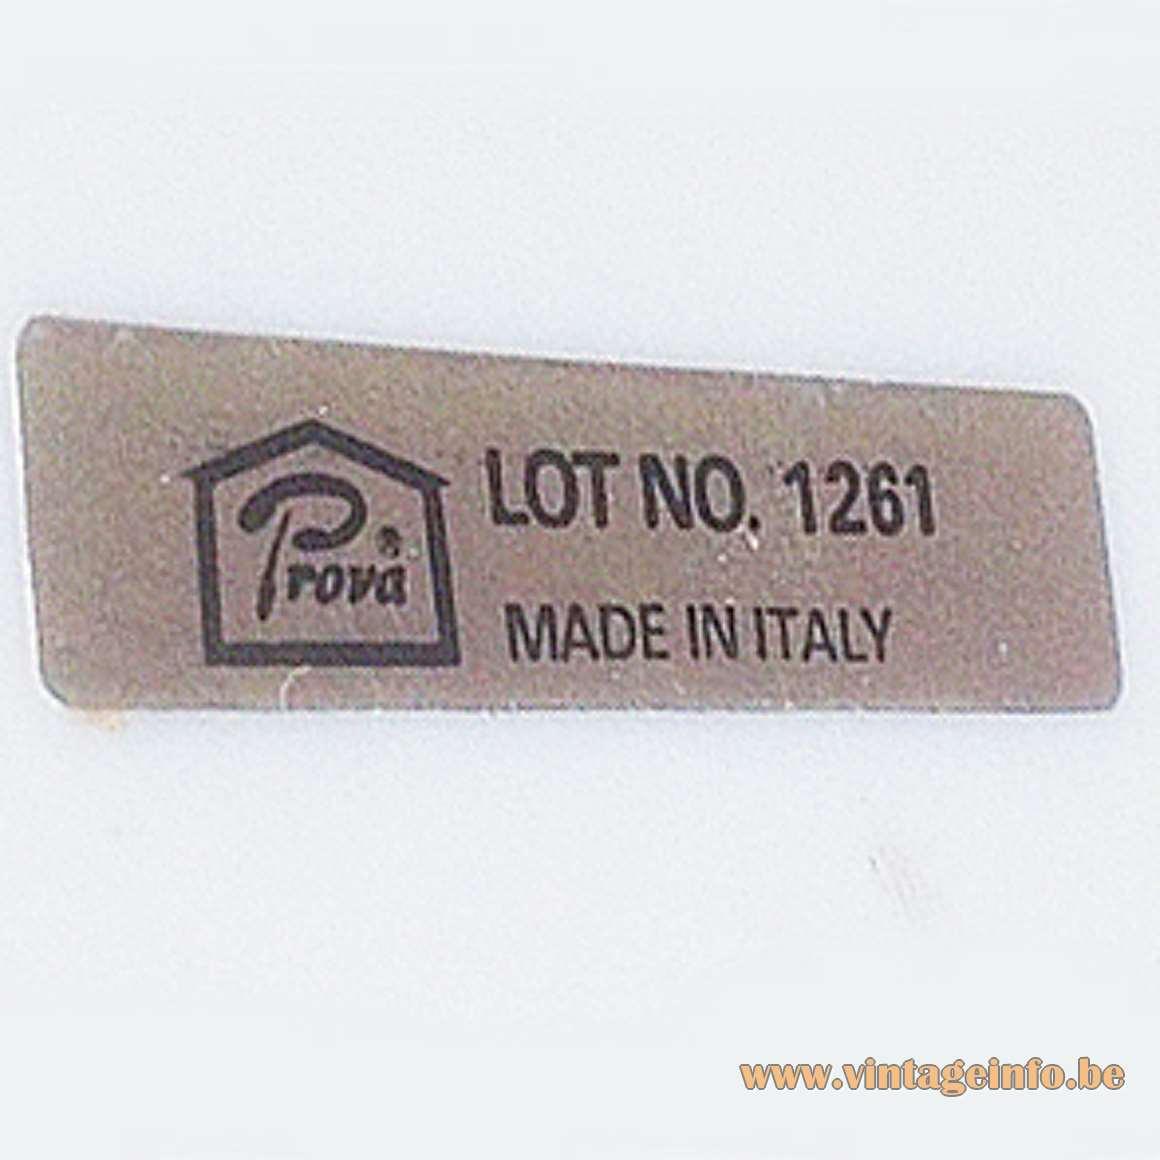 Vanilla Eyeball Desk Lamp - Prova Italy Label